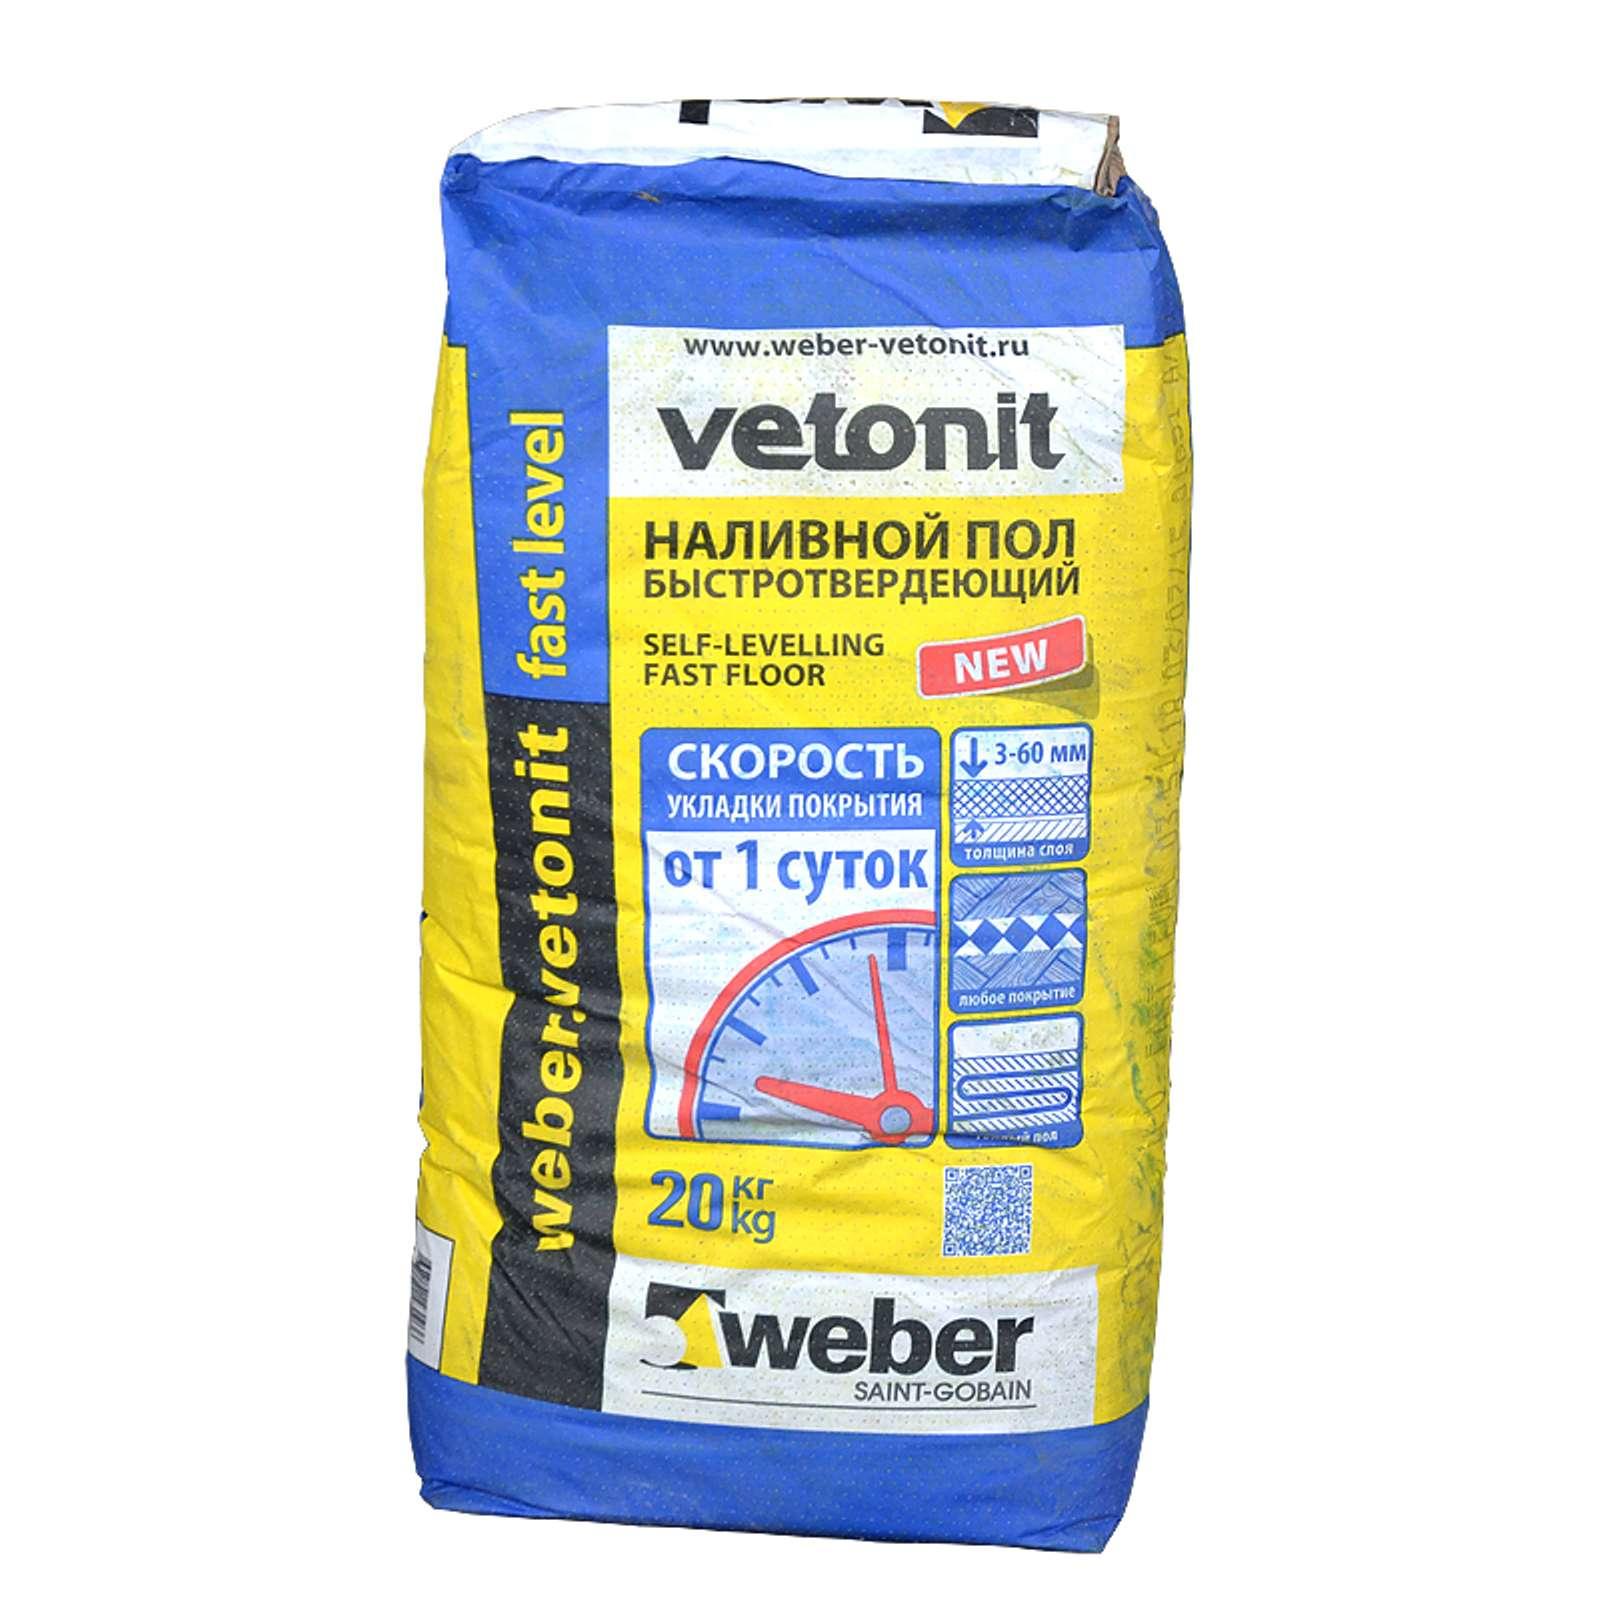 weber vetonit fast level инструкция